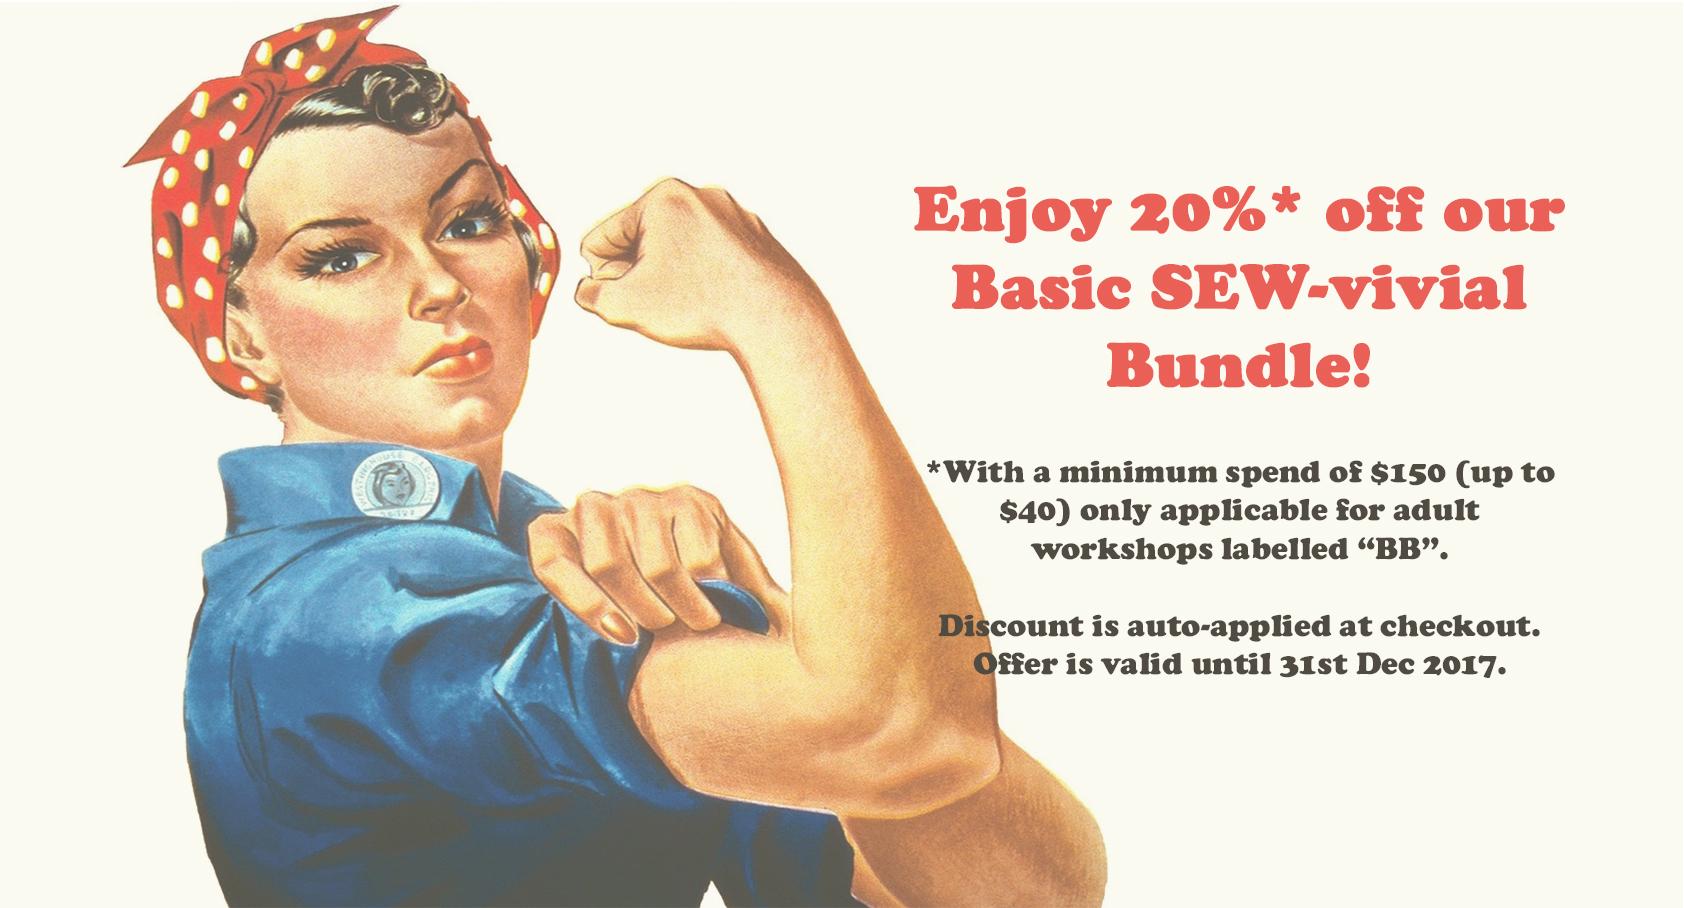 Basic Sew-vival Bundle